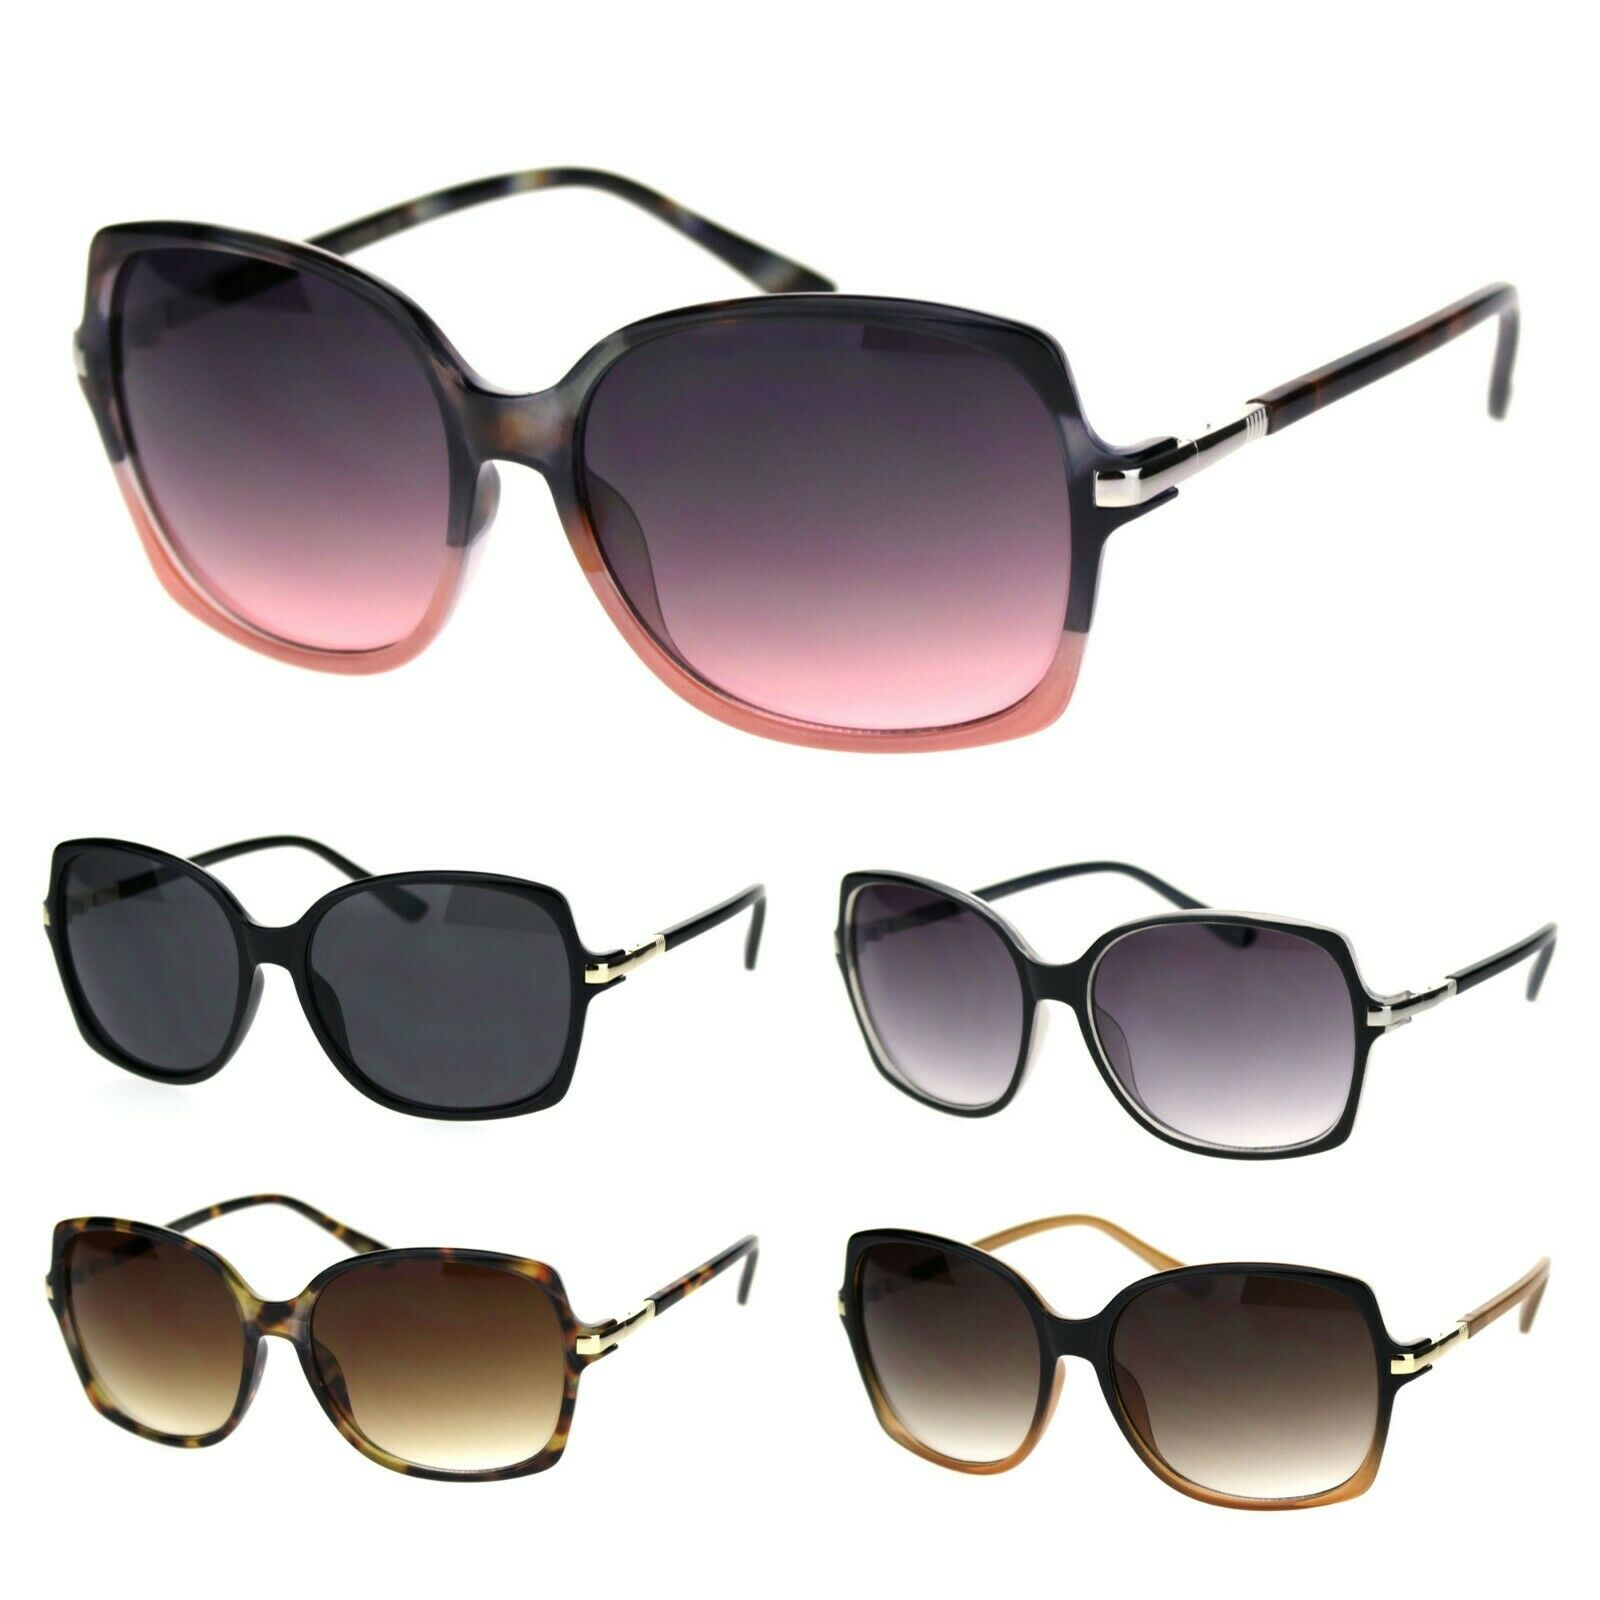 VG Eyewear Elegant Designer Fashion Diva Butterfly Sunglasses